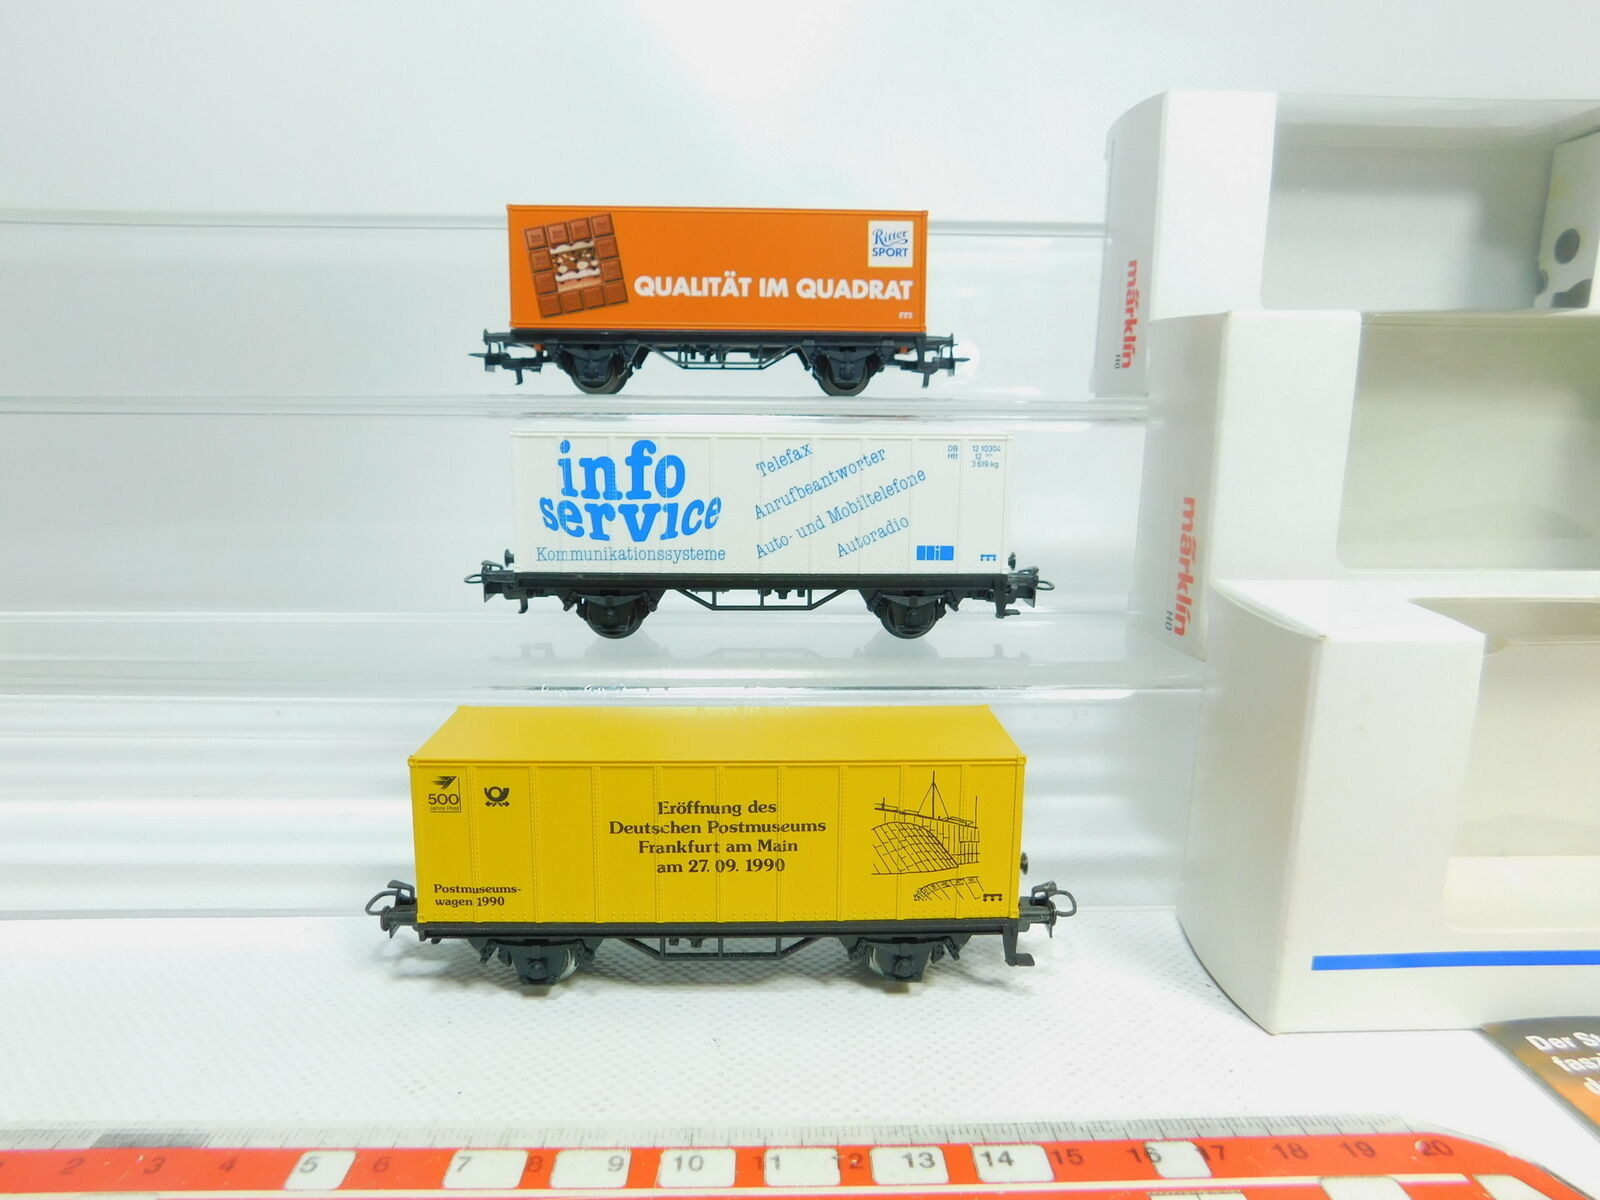 Bl477-0, 5  3x marklin h0 ac autoro container  94292 cavalieri + Museo postale etc Neuw + OVP